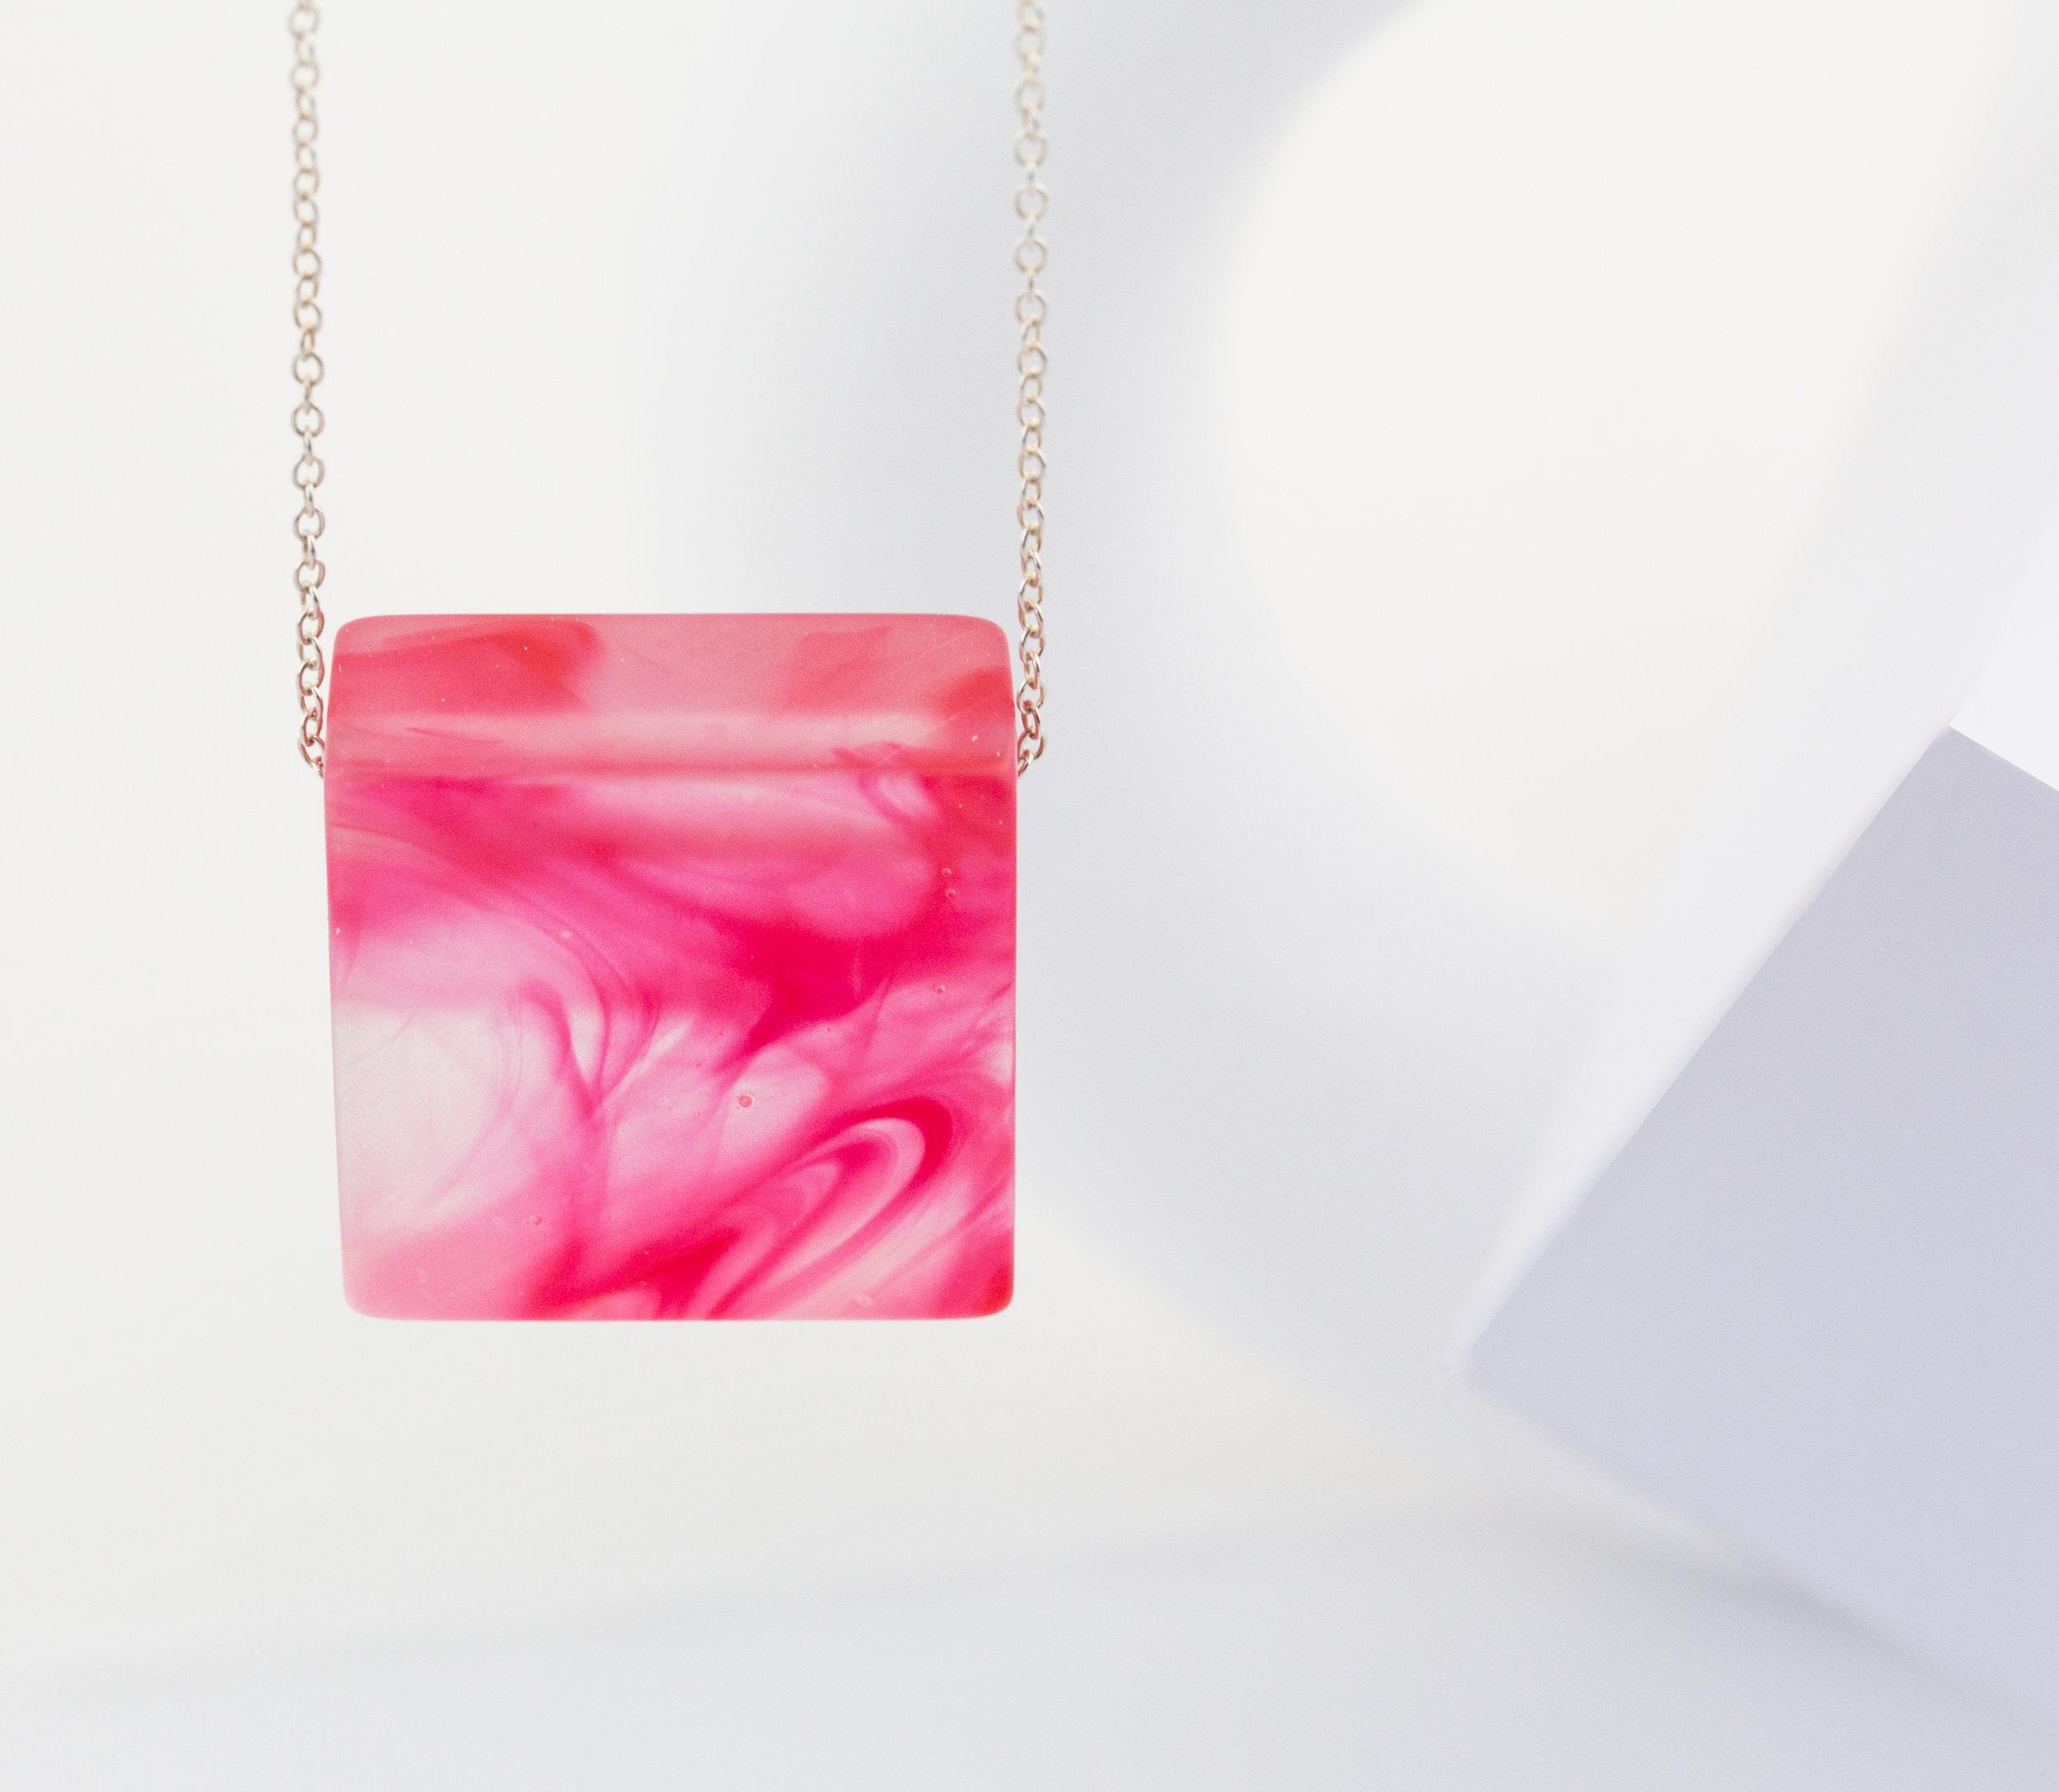 Jose+Anglada+Jewelry-Bauhaus-Necklaces